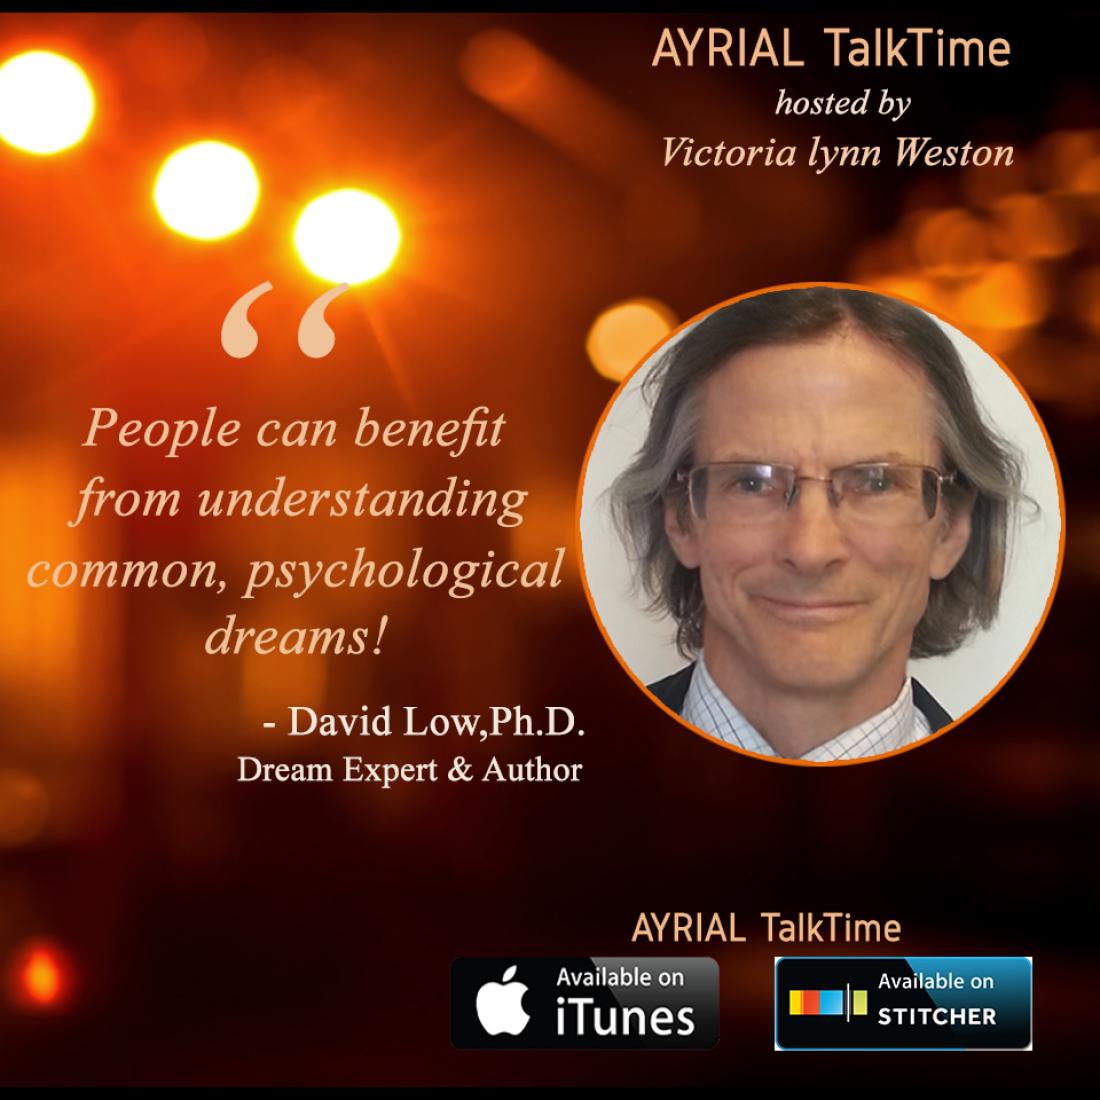 David Low, Ph.D. Dream Expert